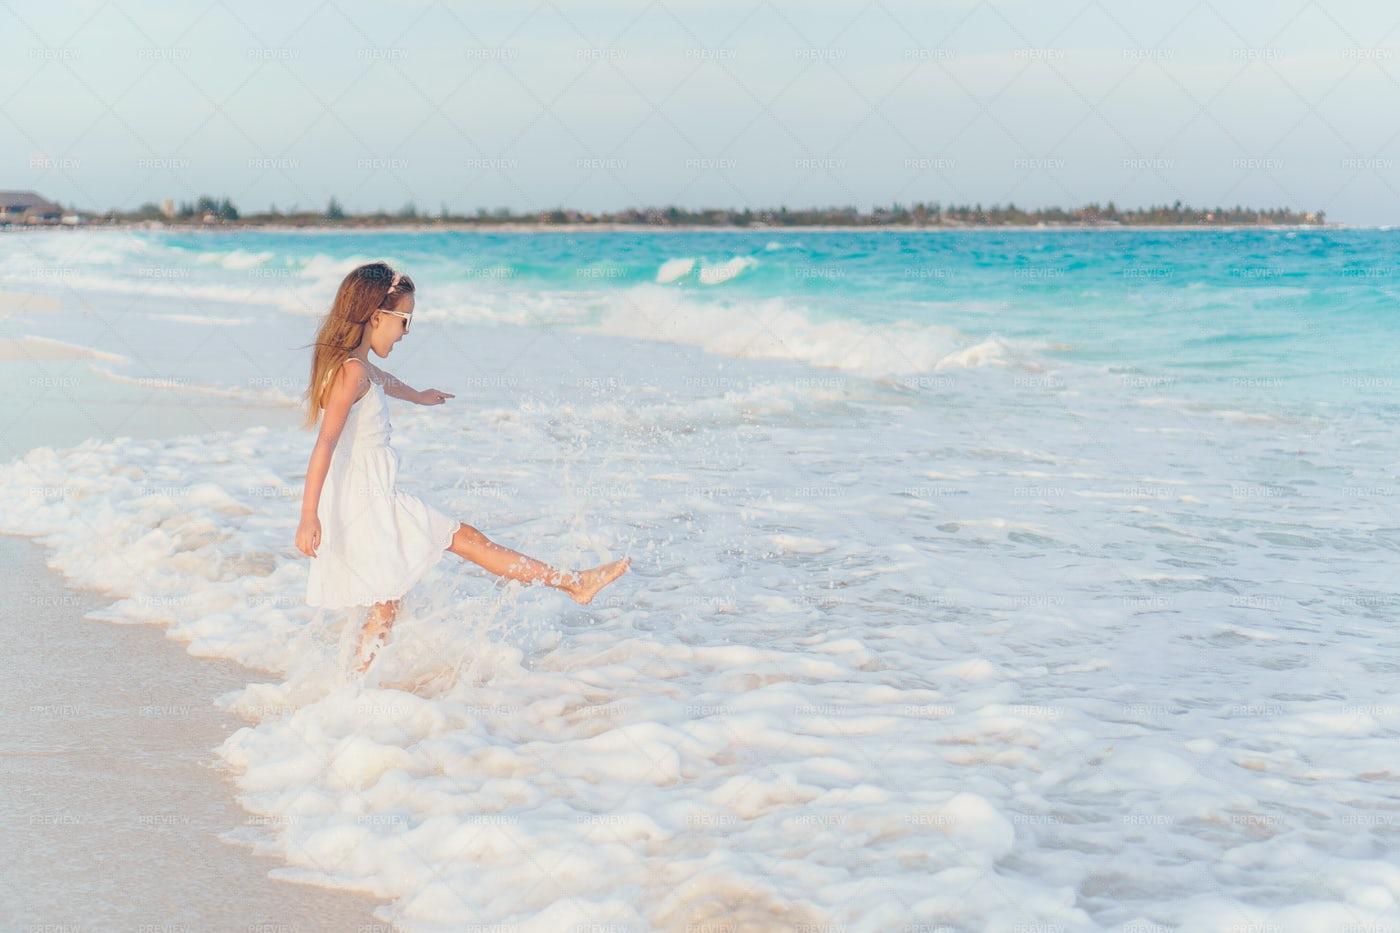 Kicking Up Water On Shore: Stock Photos